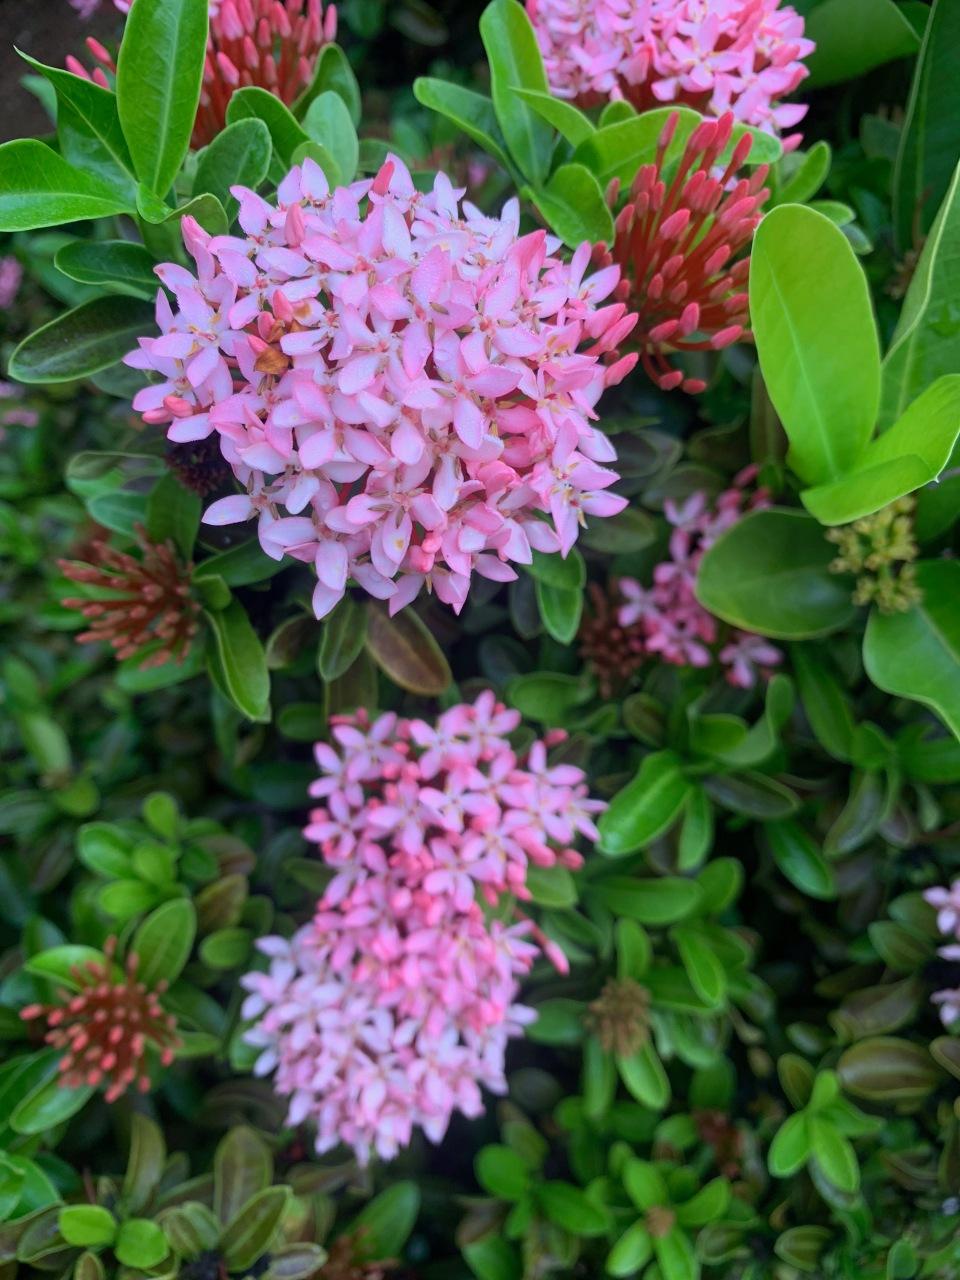 pink picuala rangoon creeper flowers